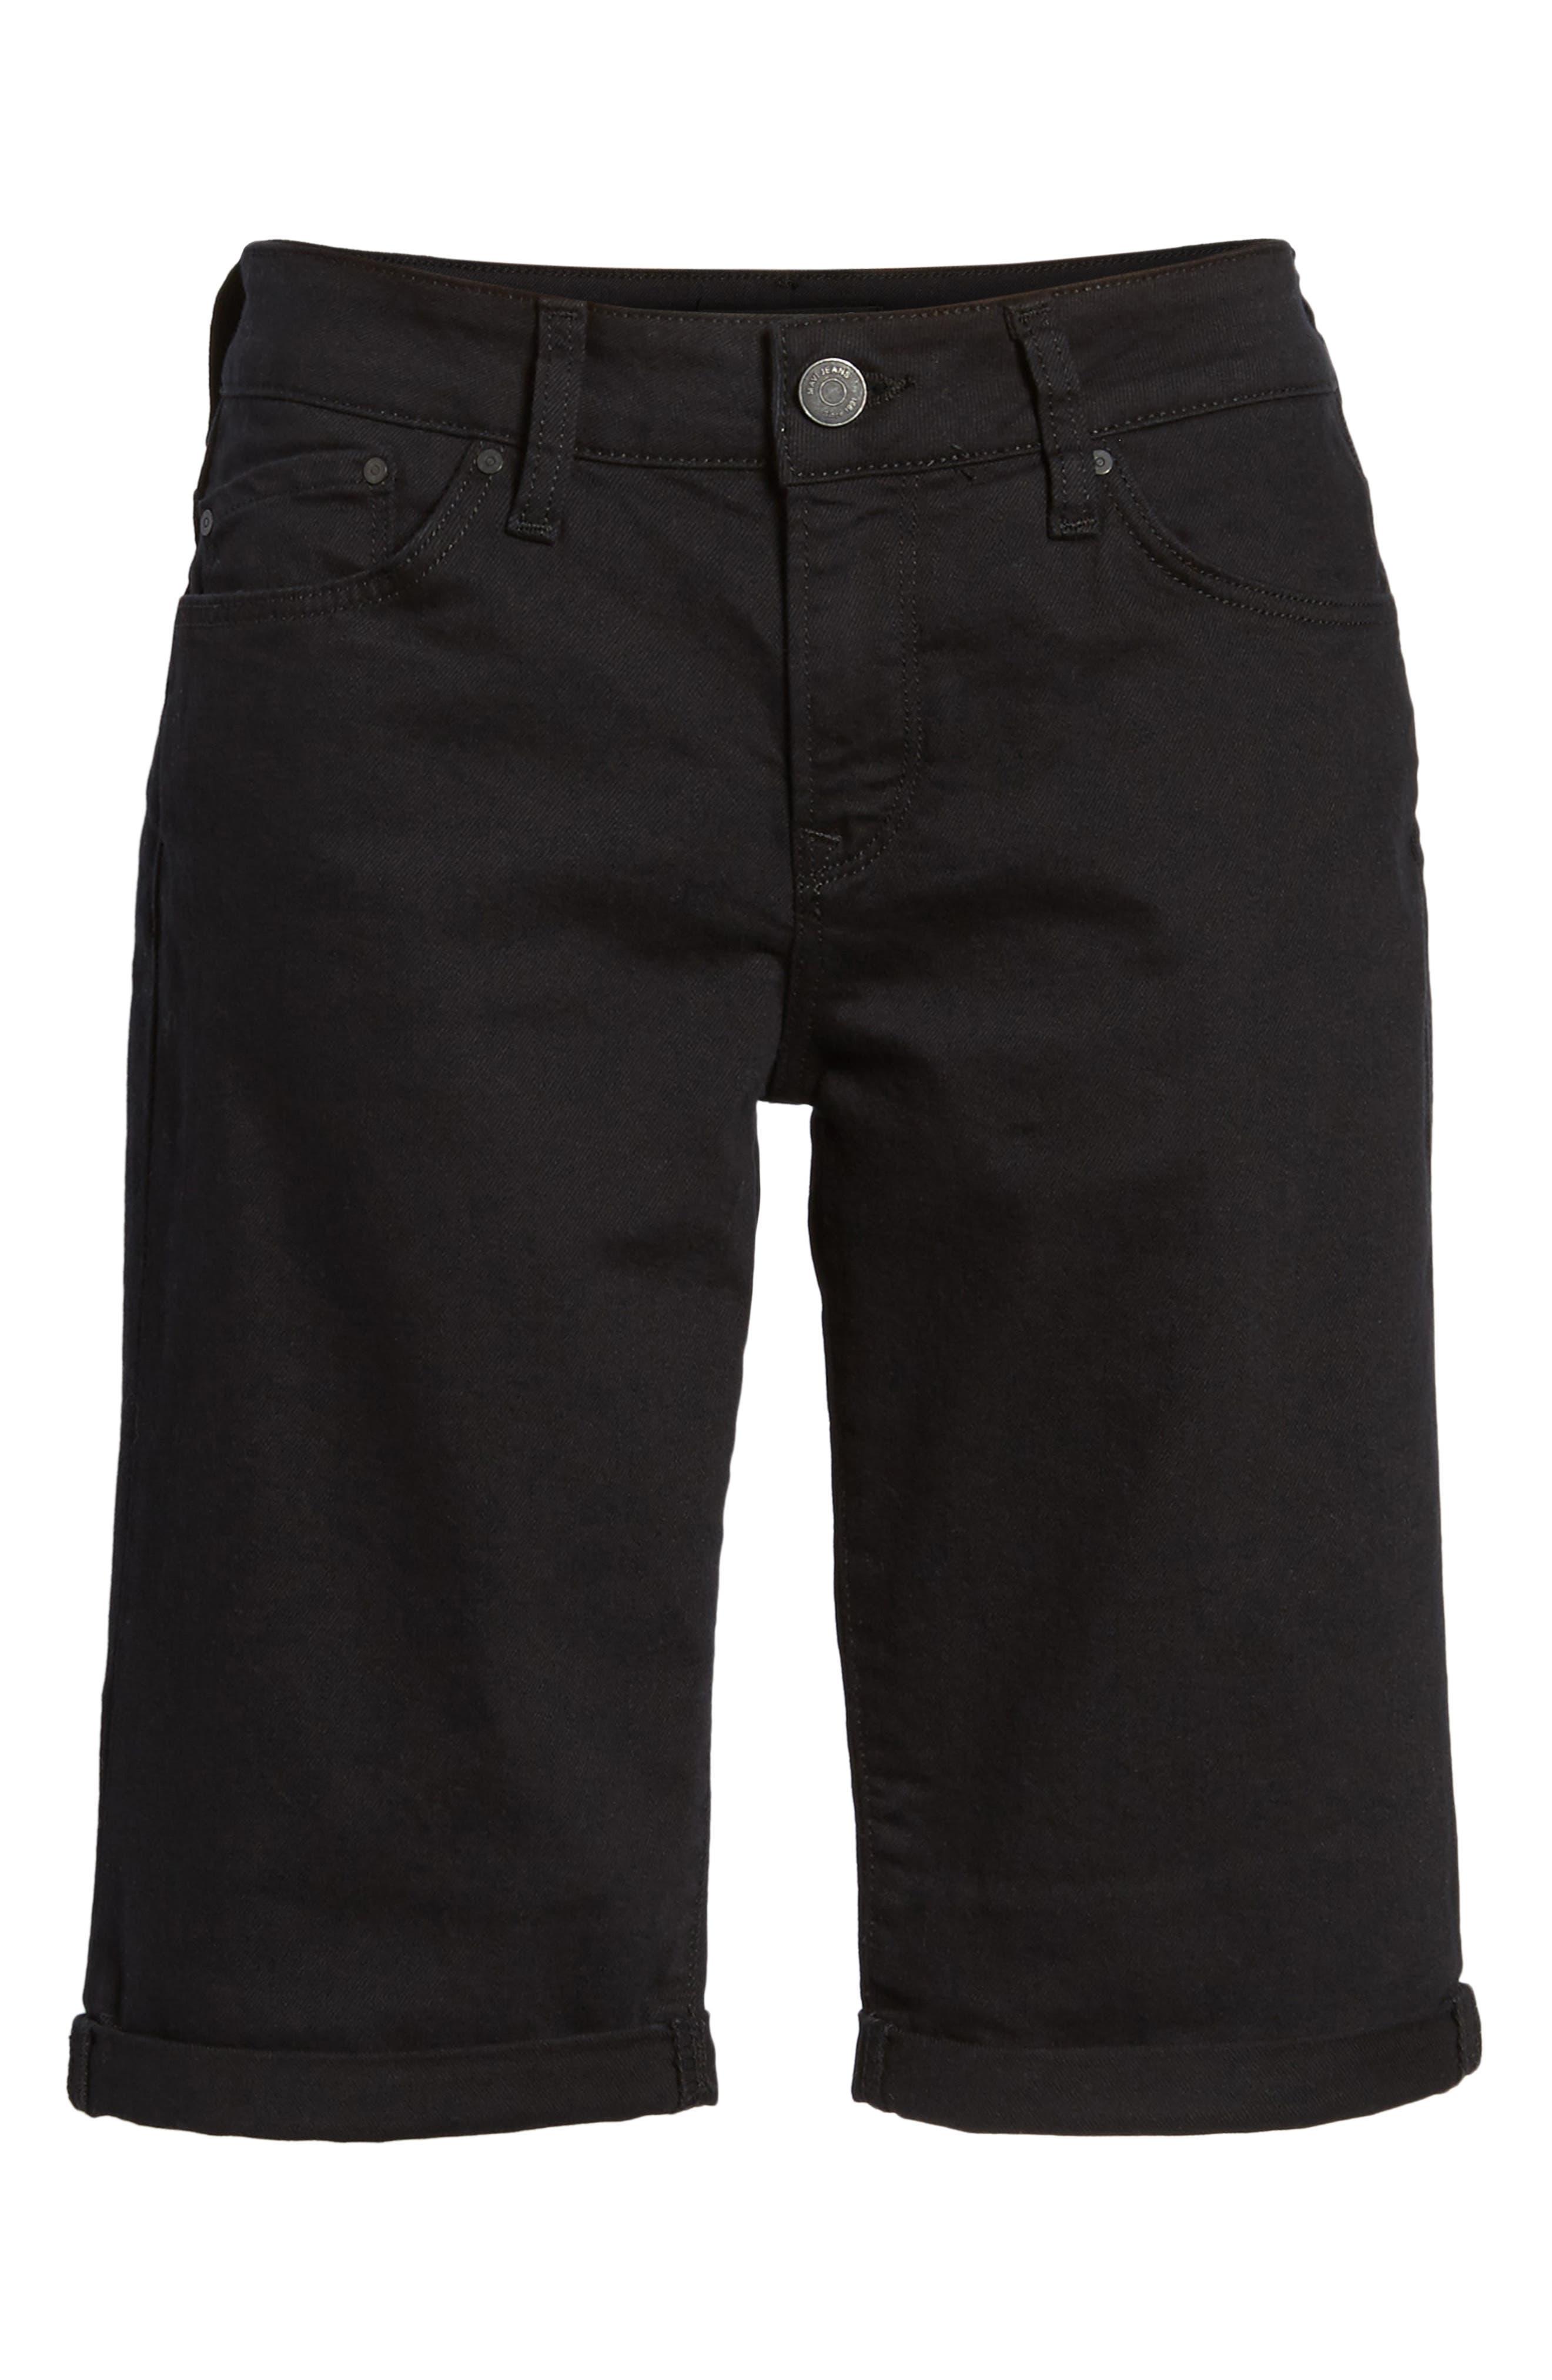 Karly Black Nolita Roll Cuff Bermuda Shorts,                             Alternate thumbnail 6, color,